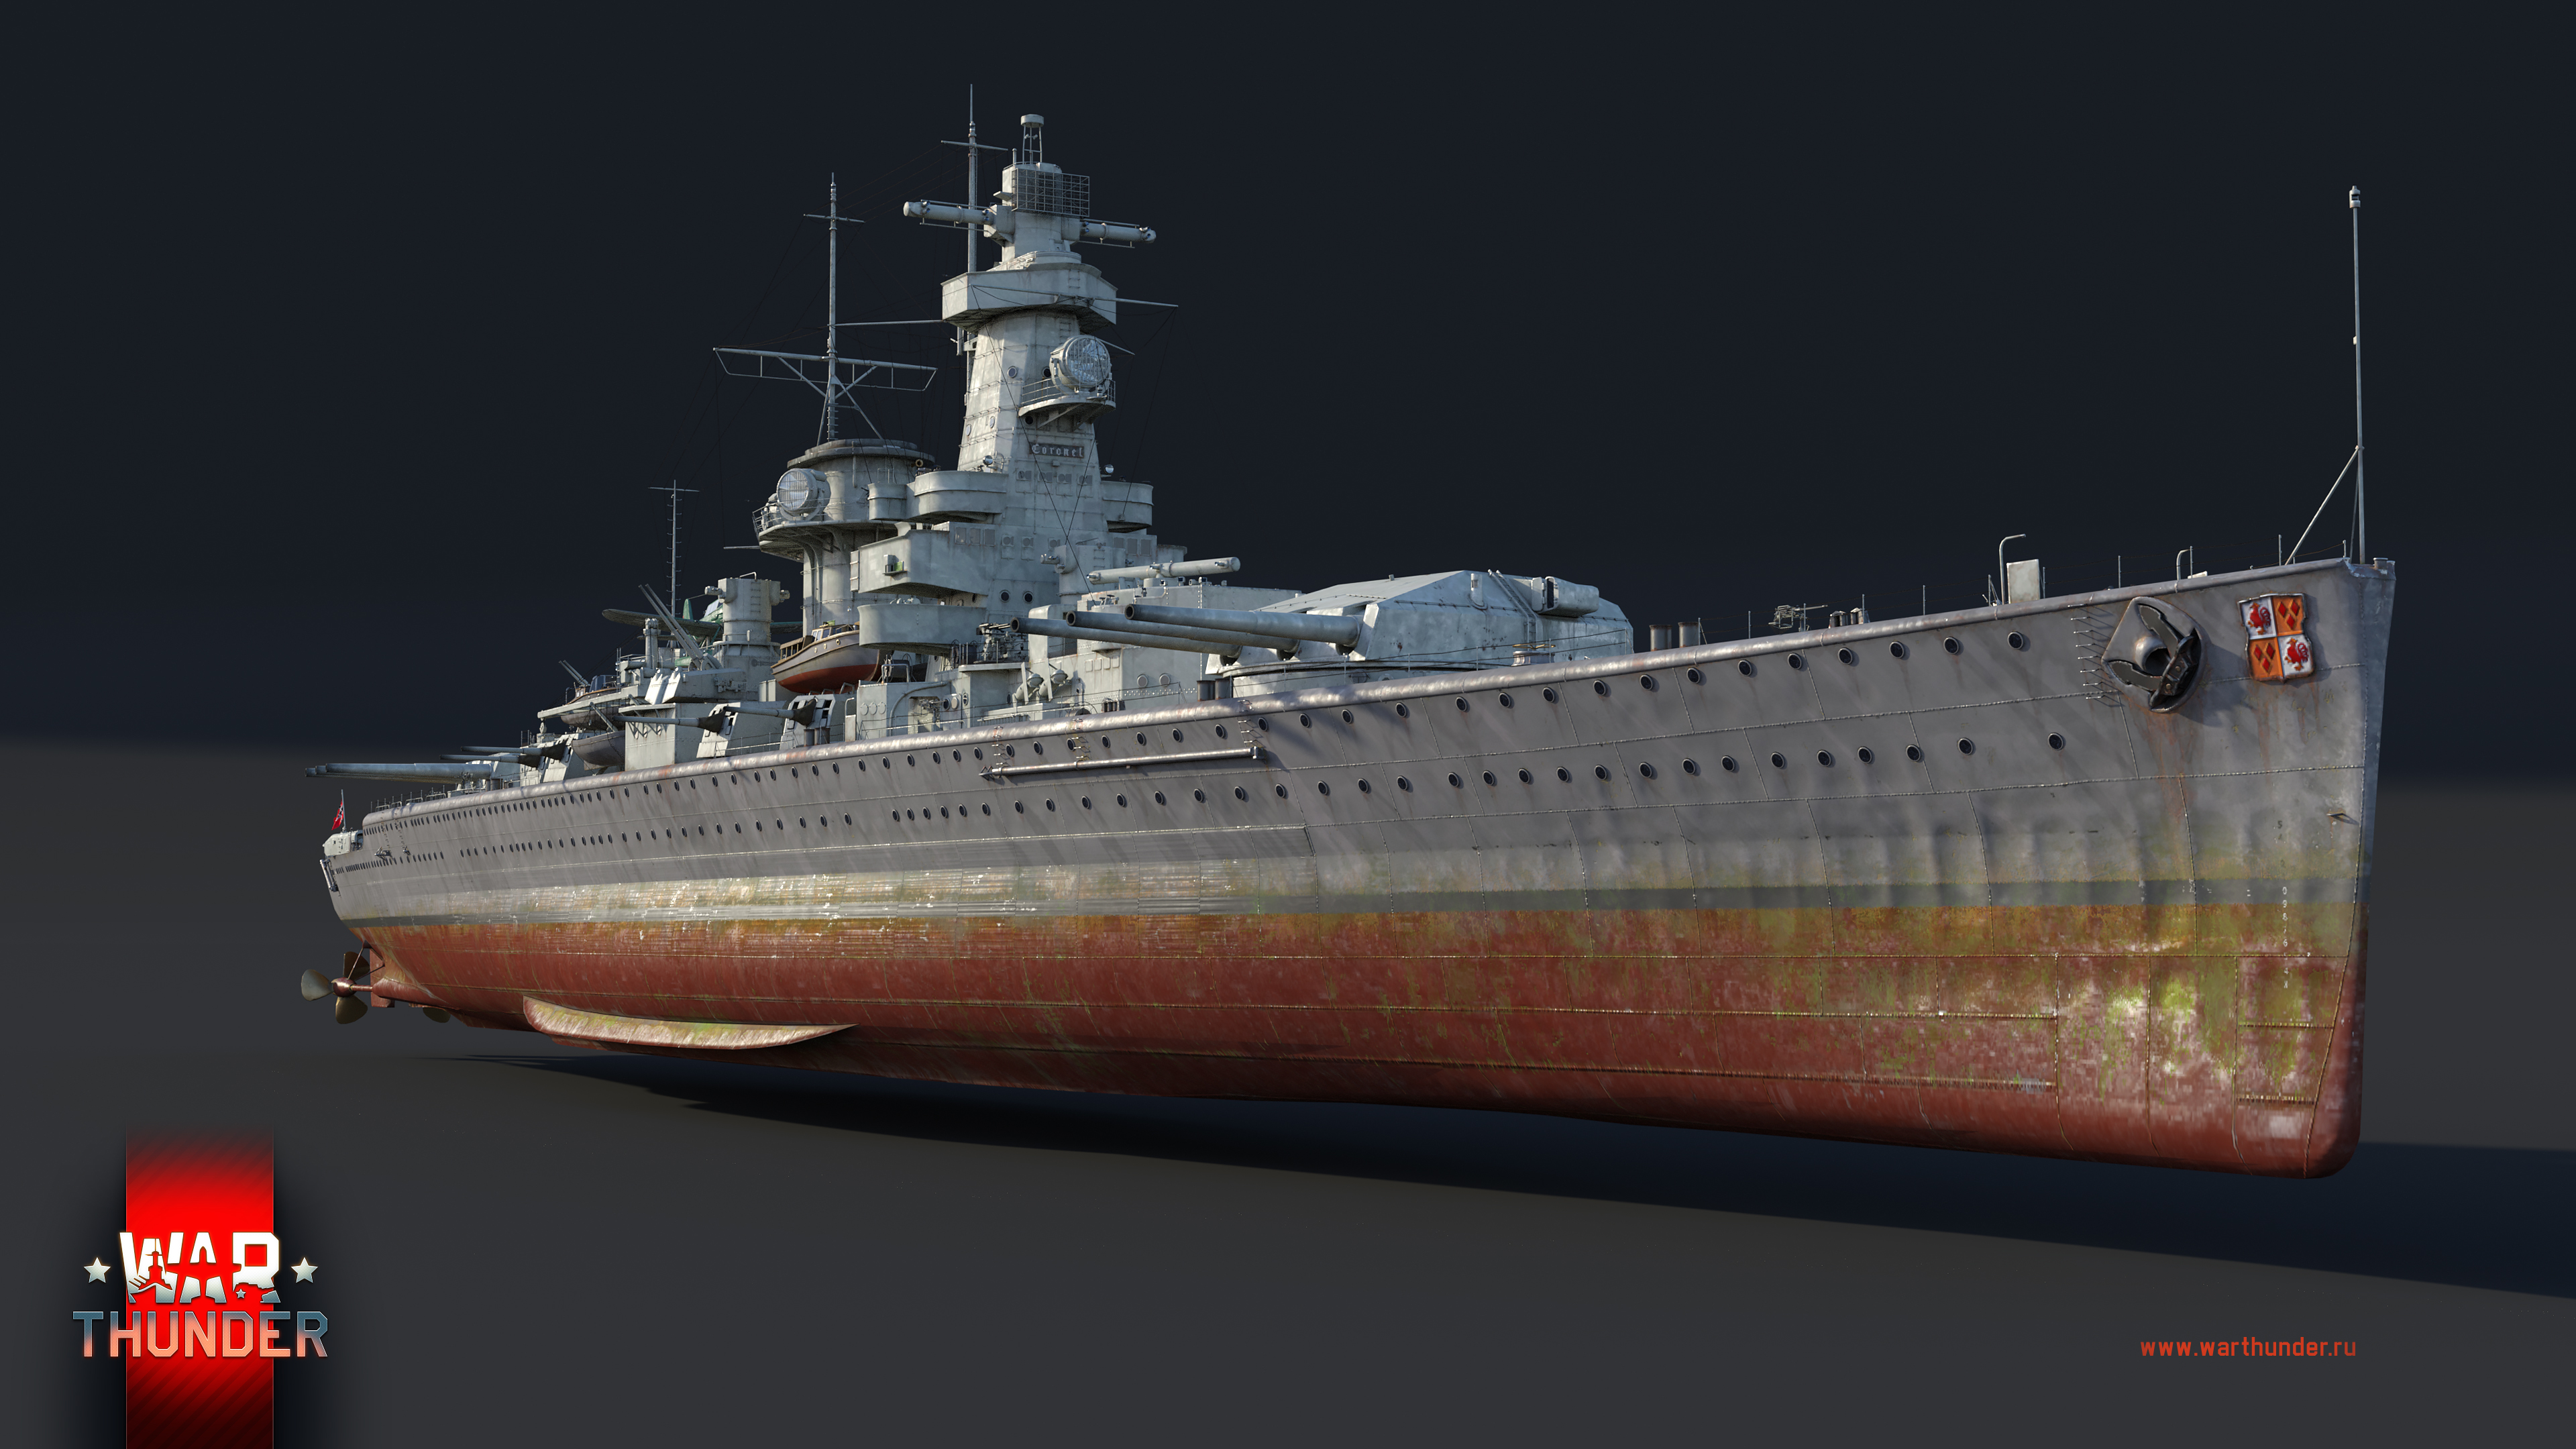 cruiser_admiral_graf_shpee_3840x2160_log